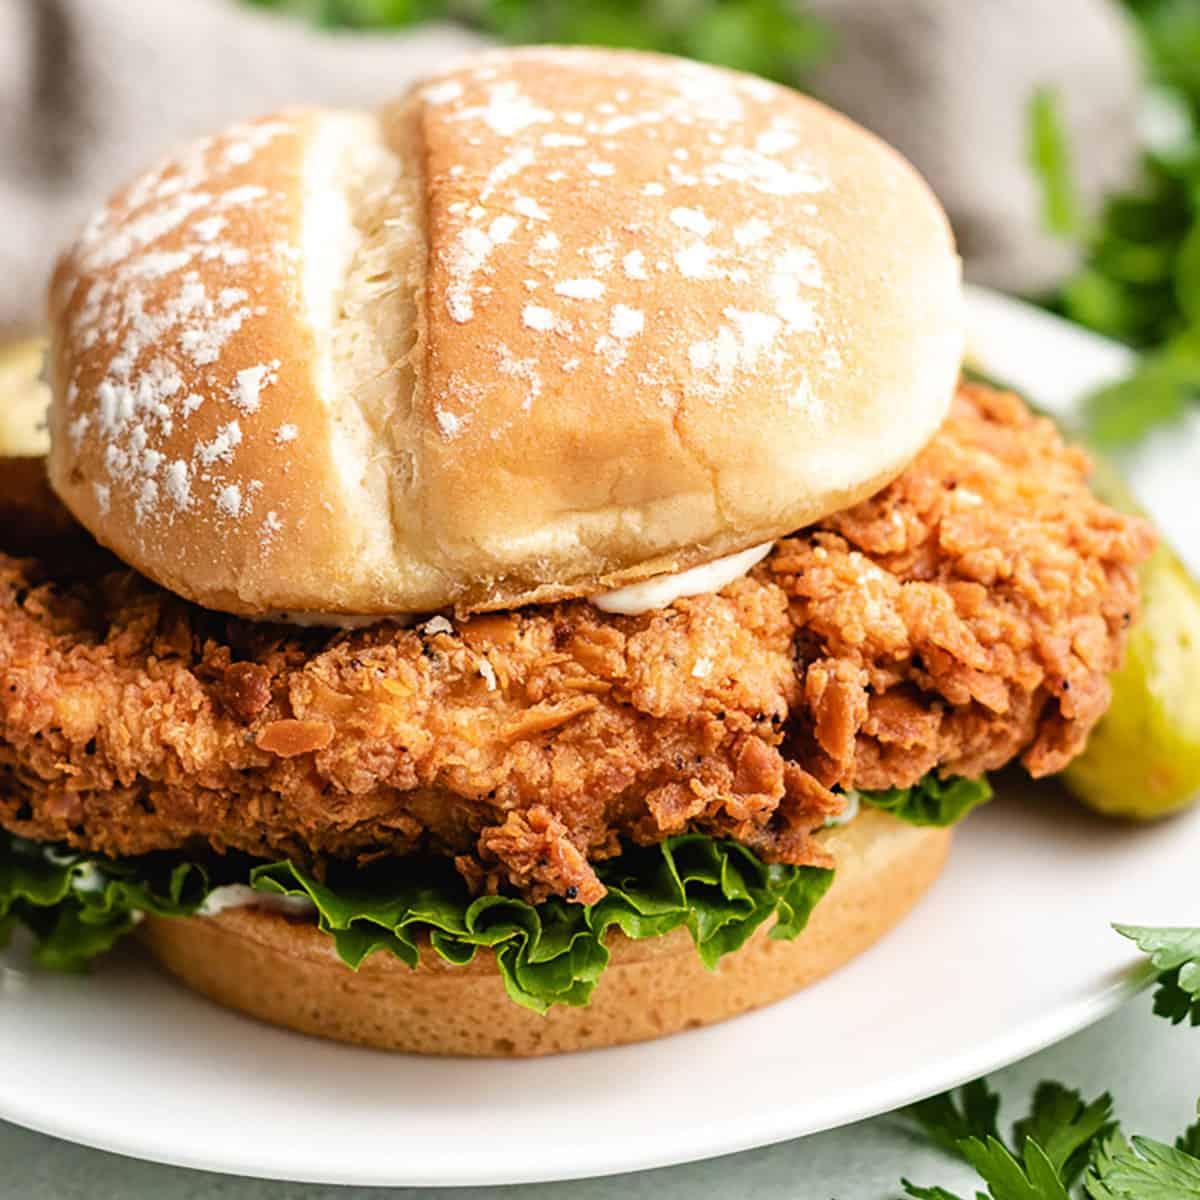 Spicy chicken sandwich featured image recipes